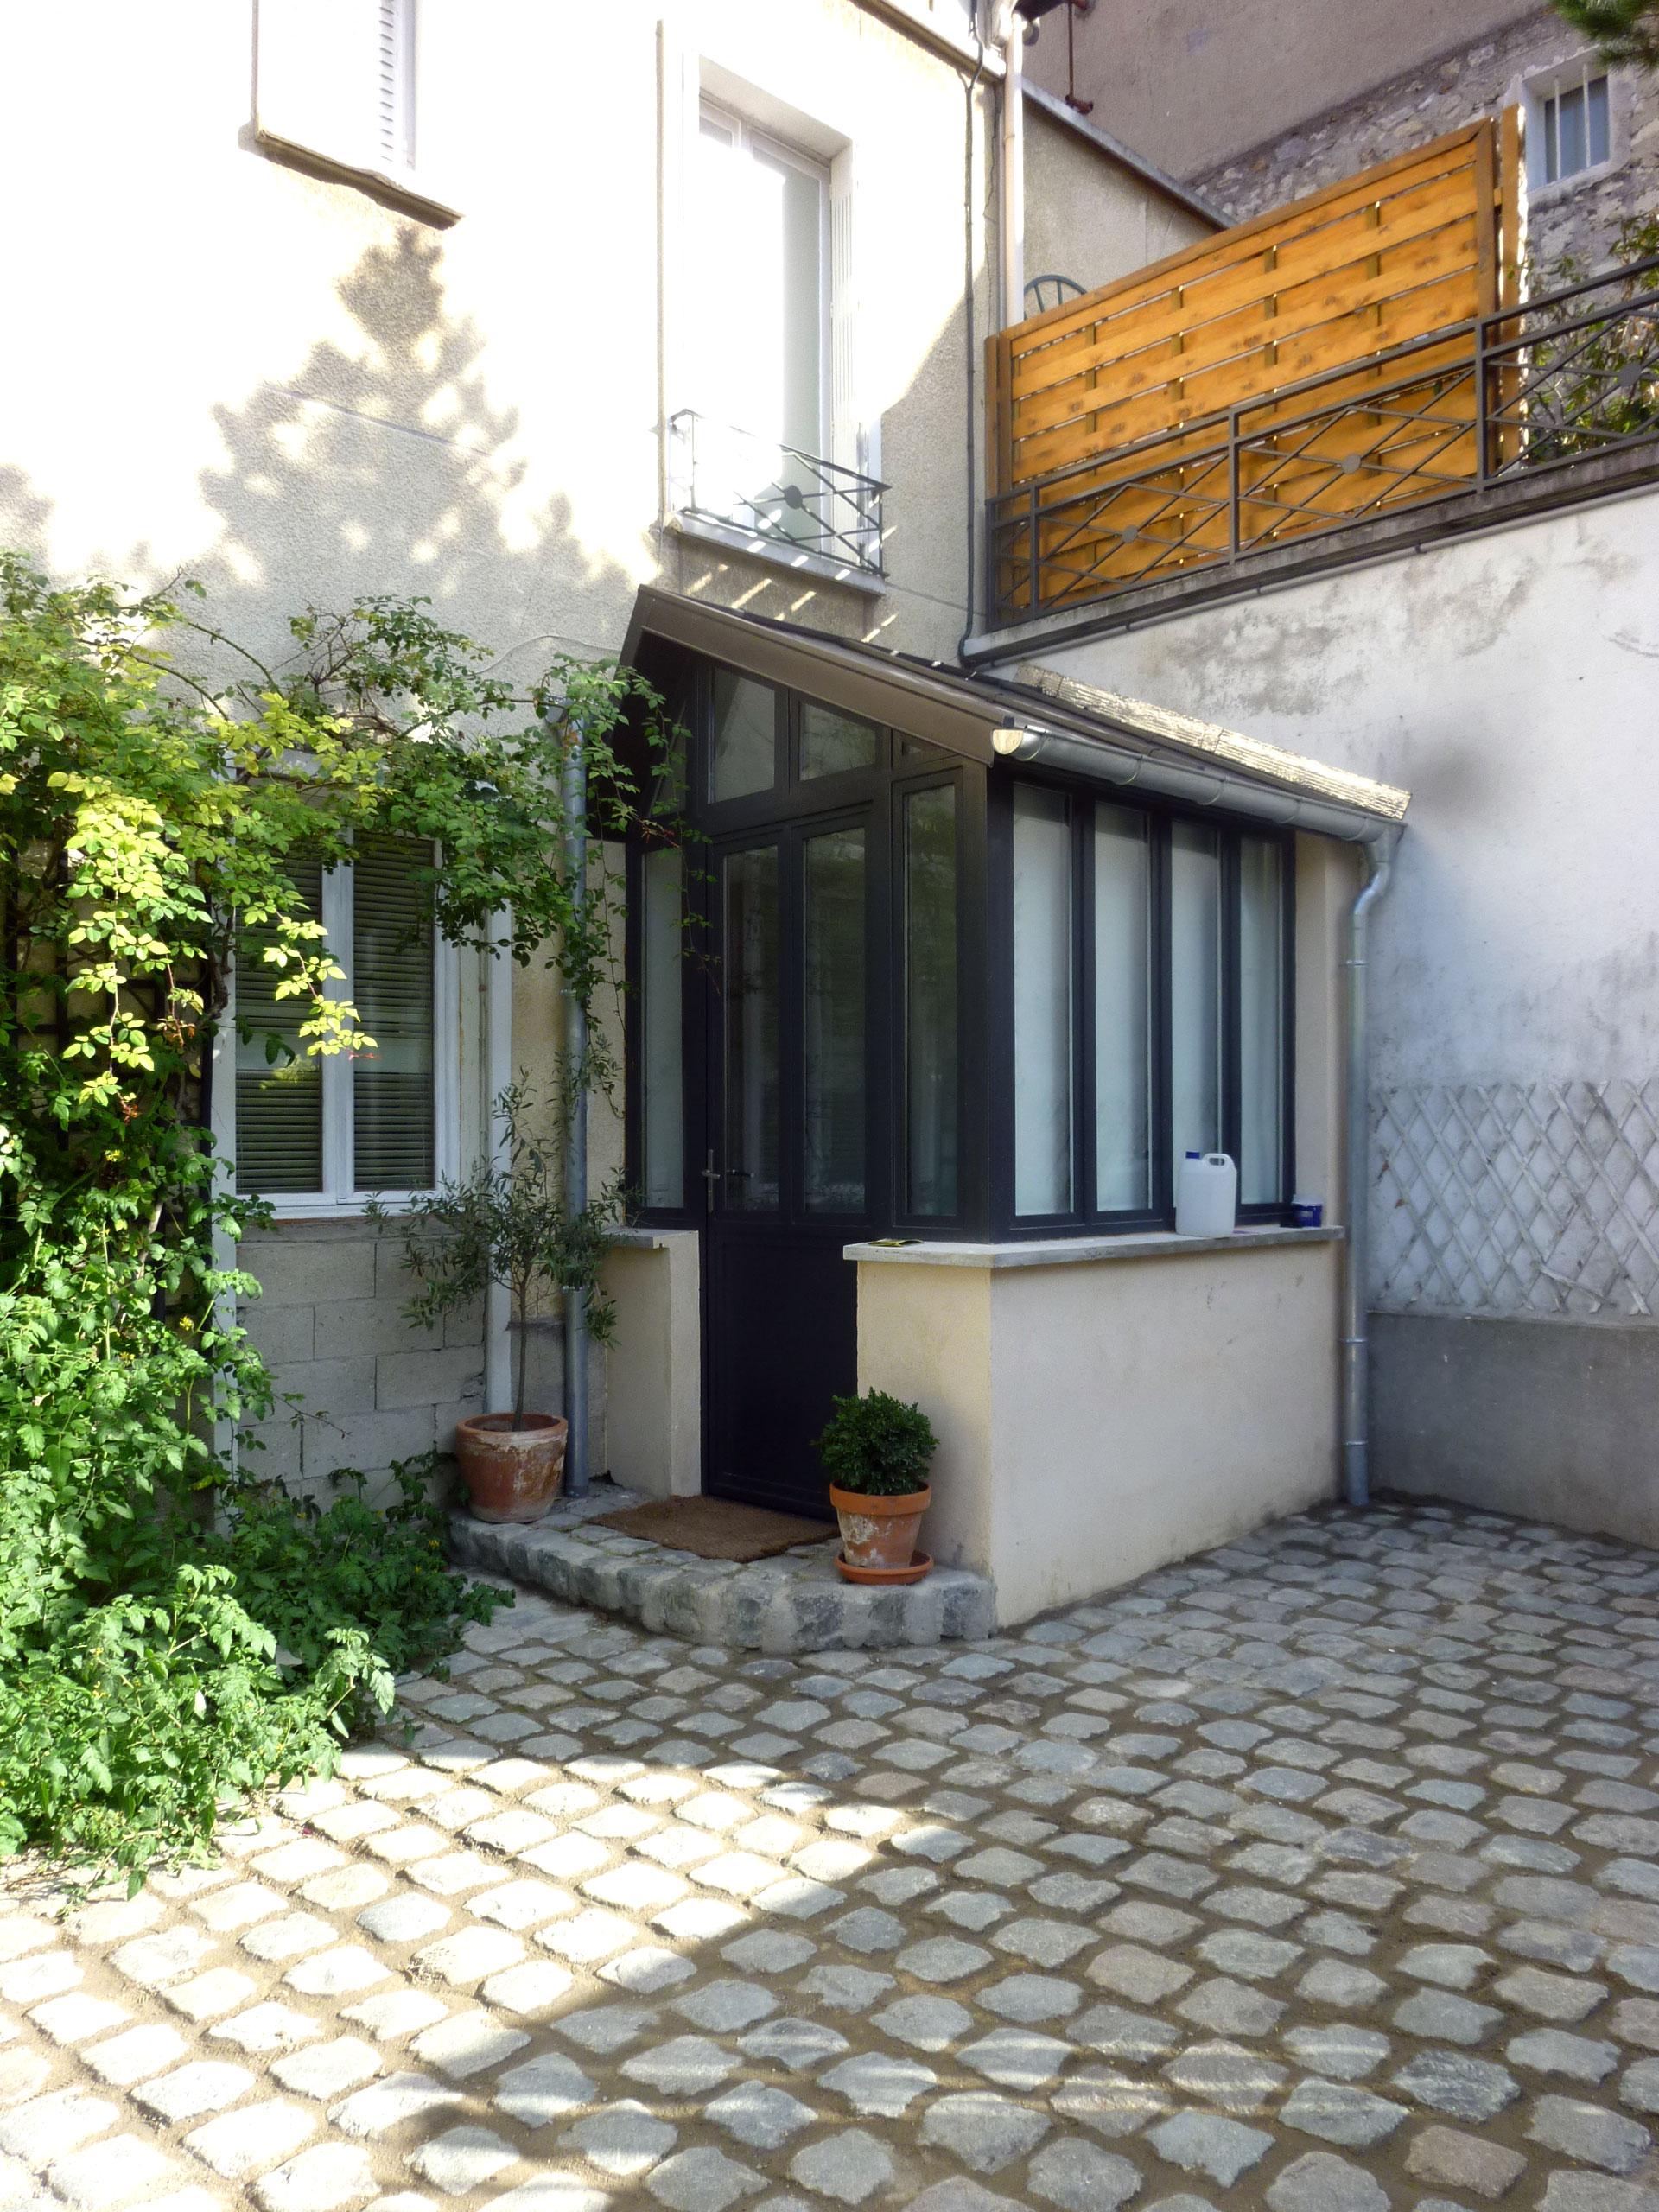 olivier-stadler-architecte-meudon-rehabilitation-extensions-maison (18)